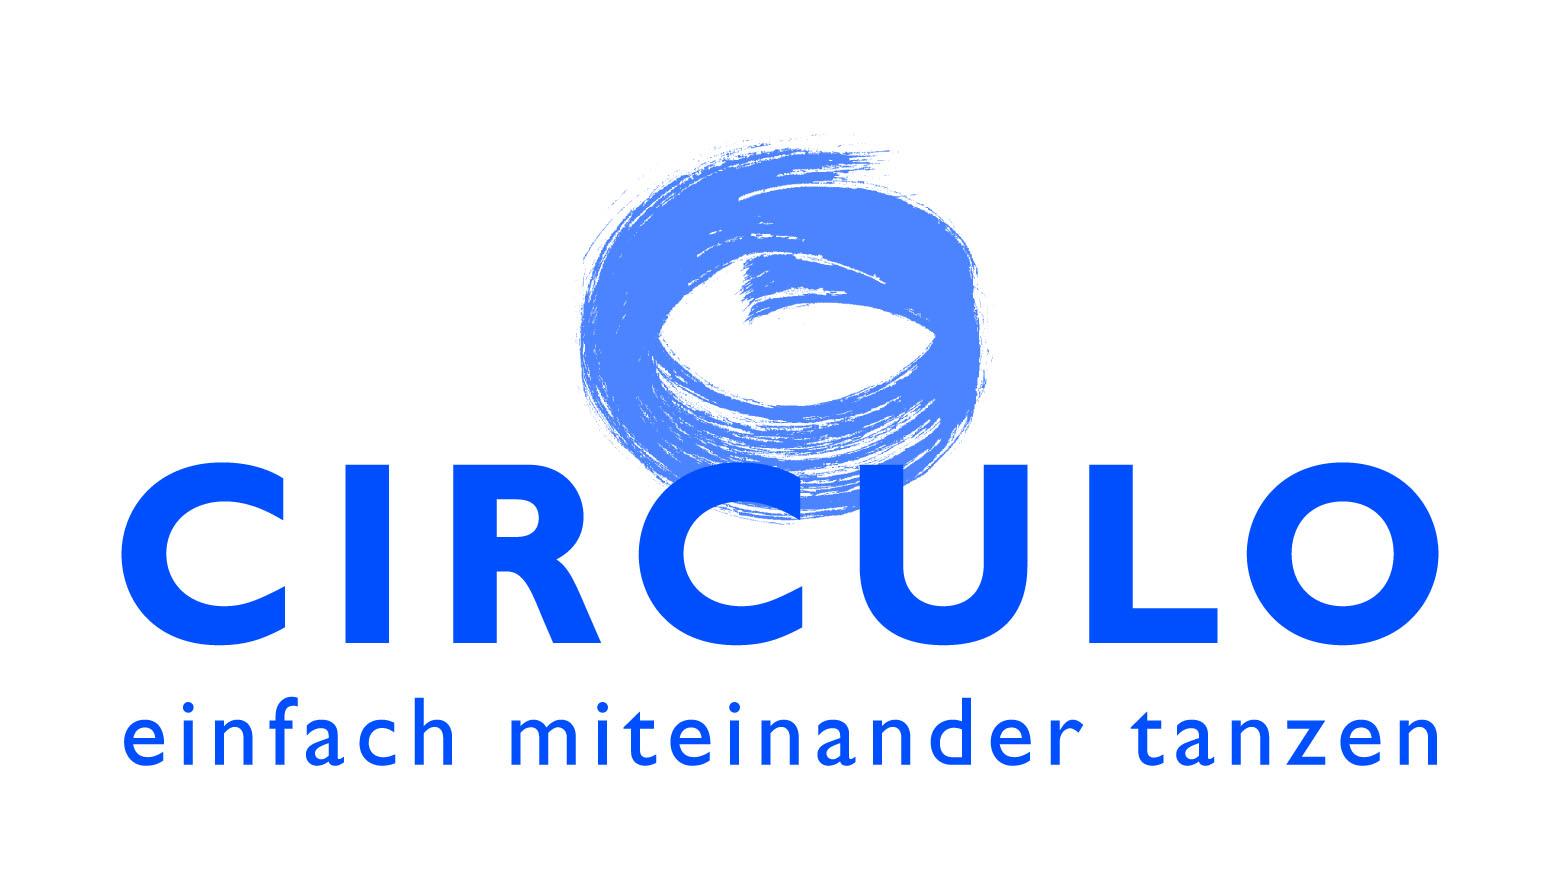 circulo_logo_4c.jpg